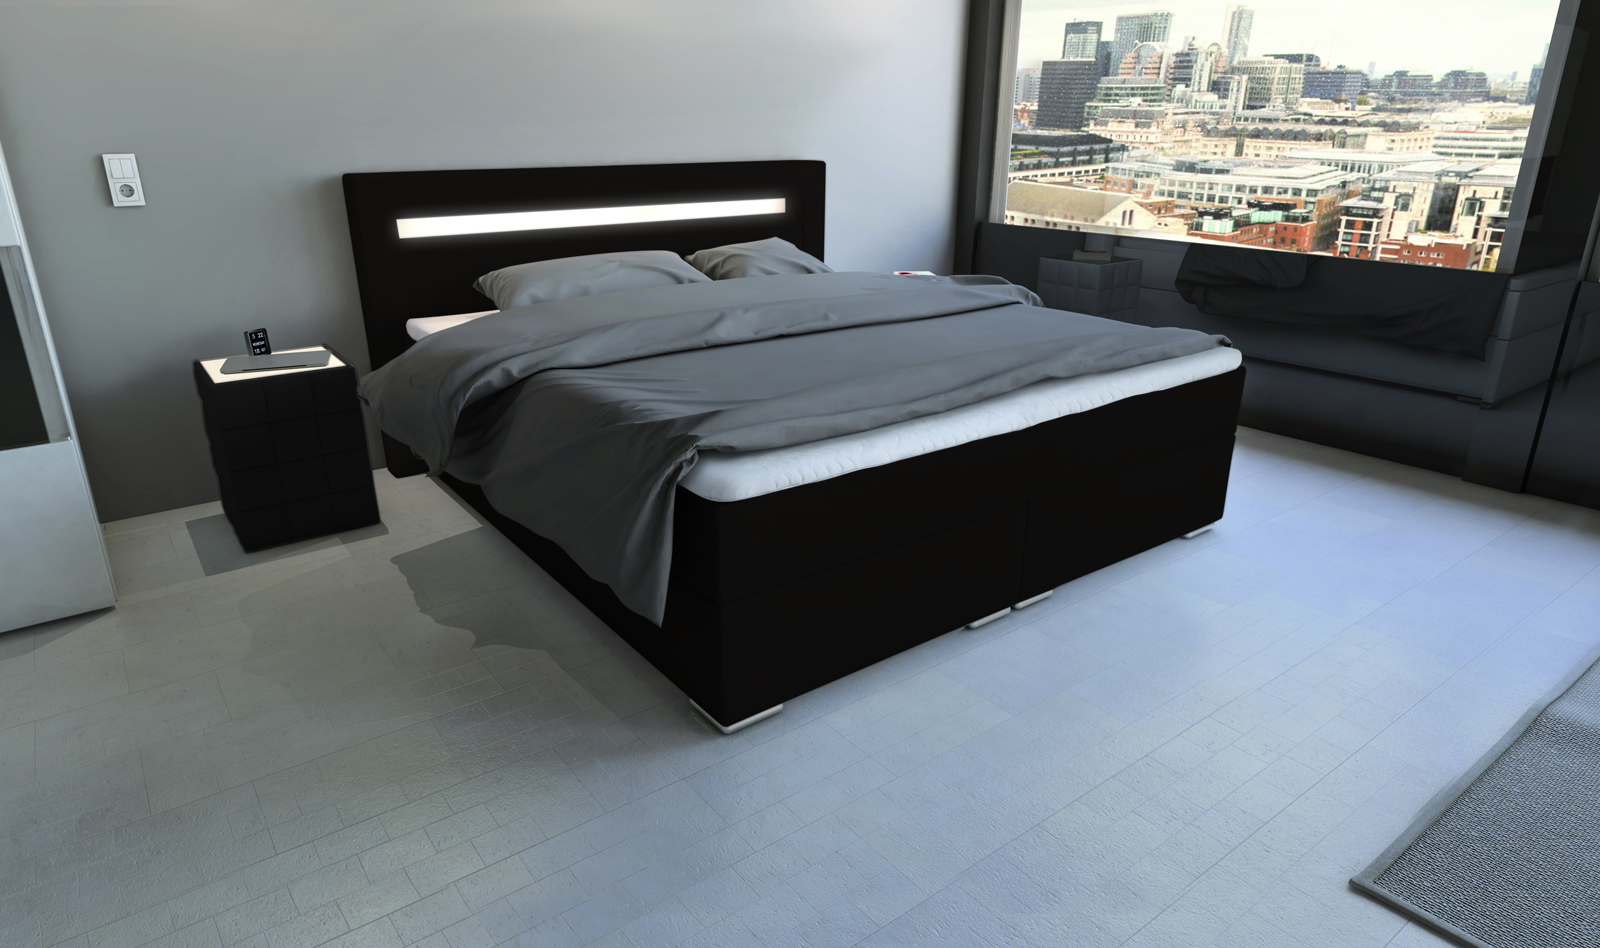 SAM® Boxspringbett Hotelbett LED 180 X 200 Cm Schwarz Arizona